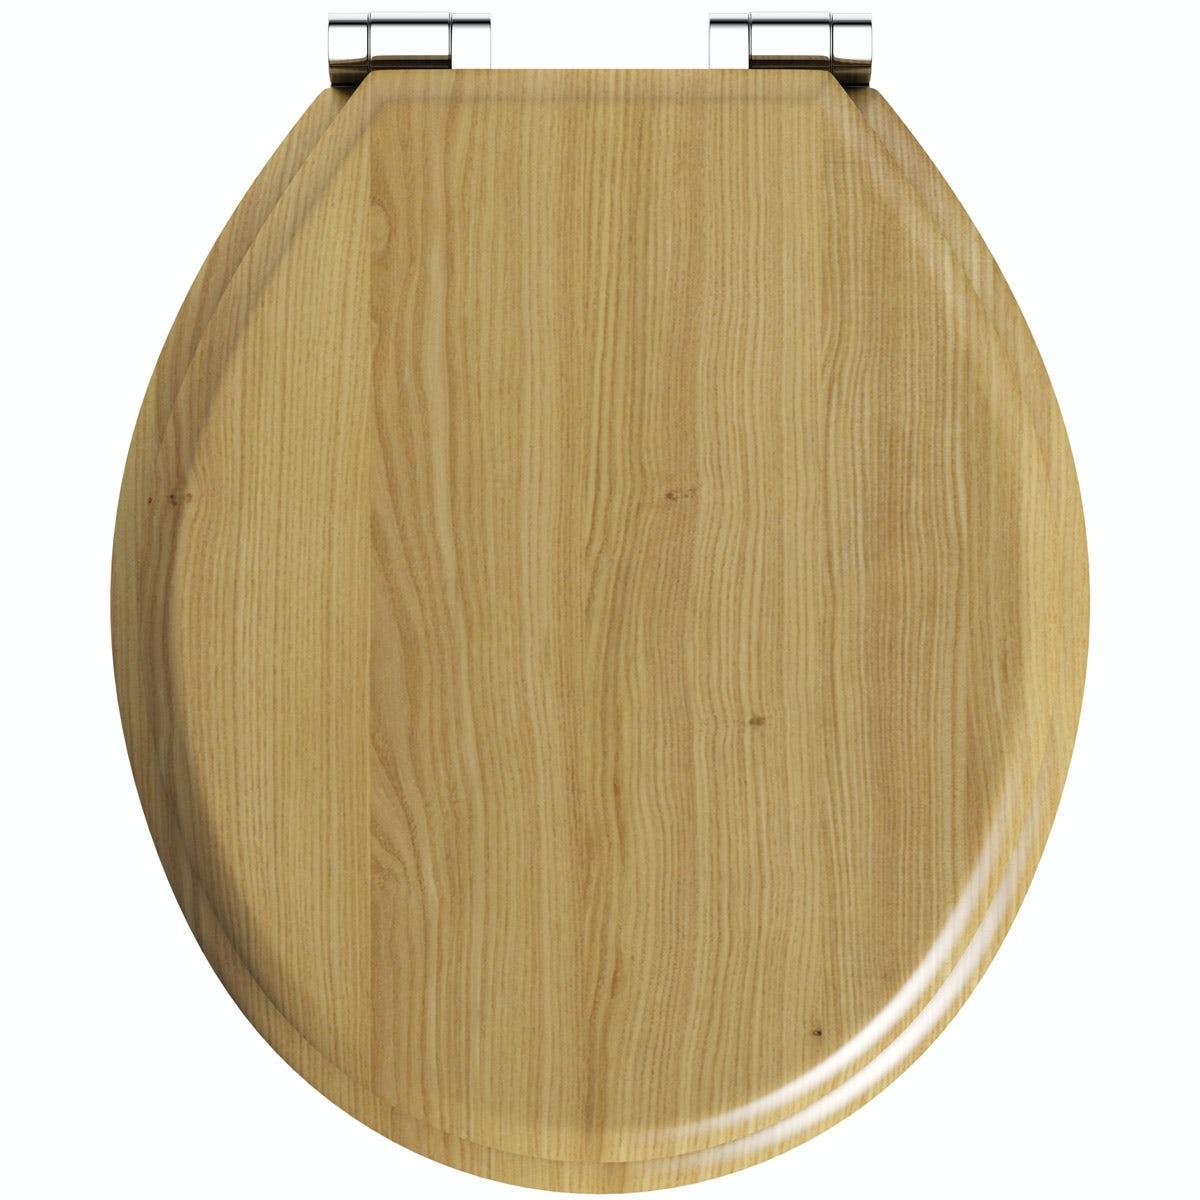 The Bath Co. traditional oak effect soft close seat